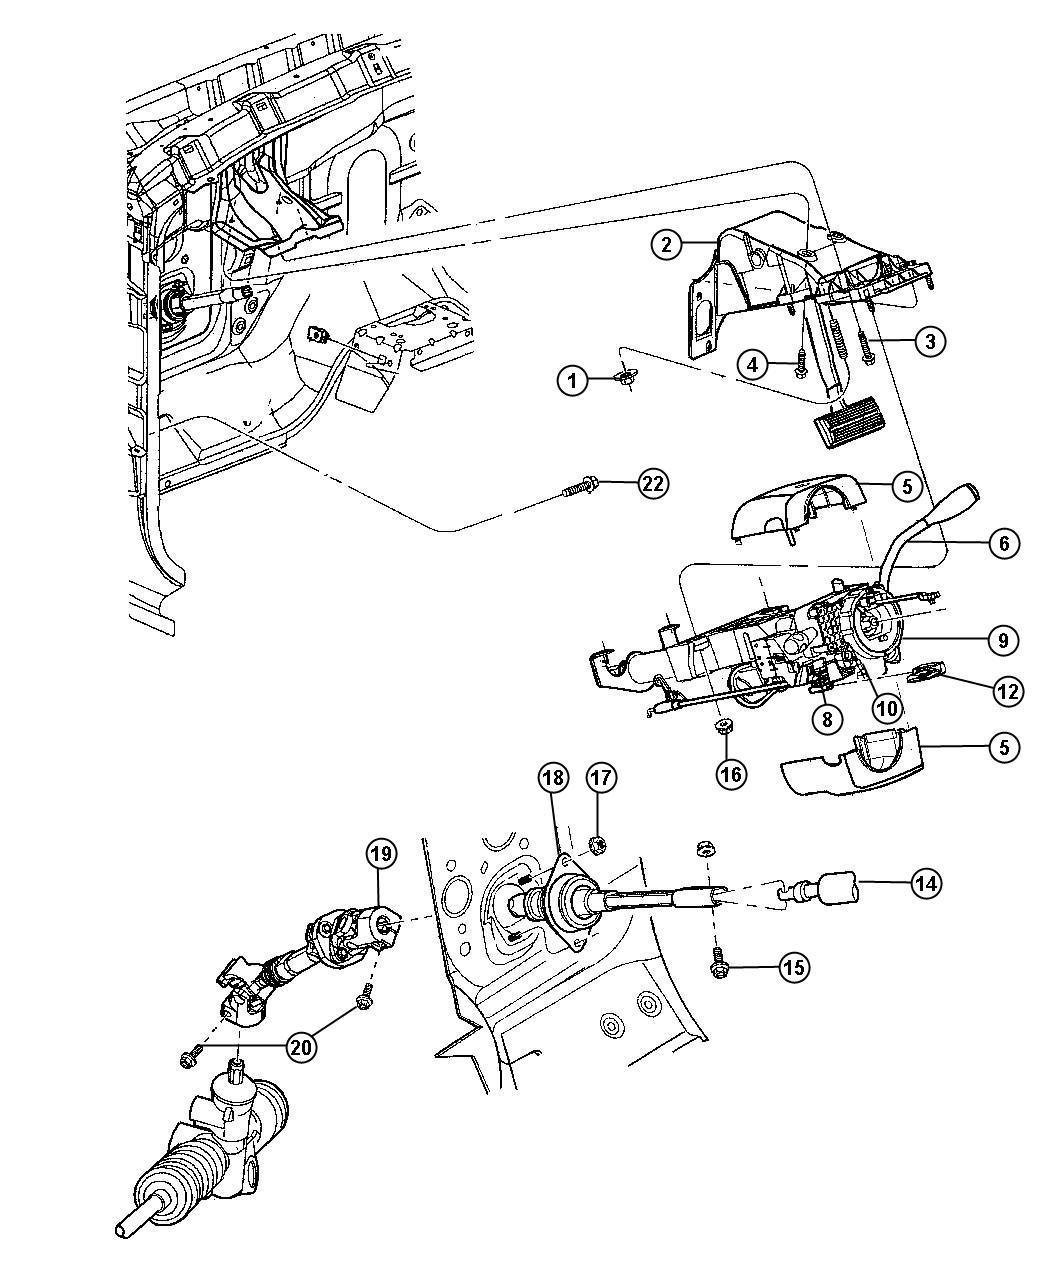 2008 Dodge Durango Lever. Tilt column release